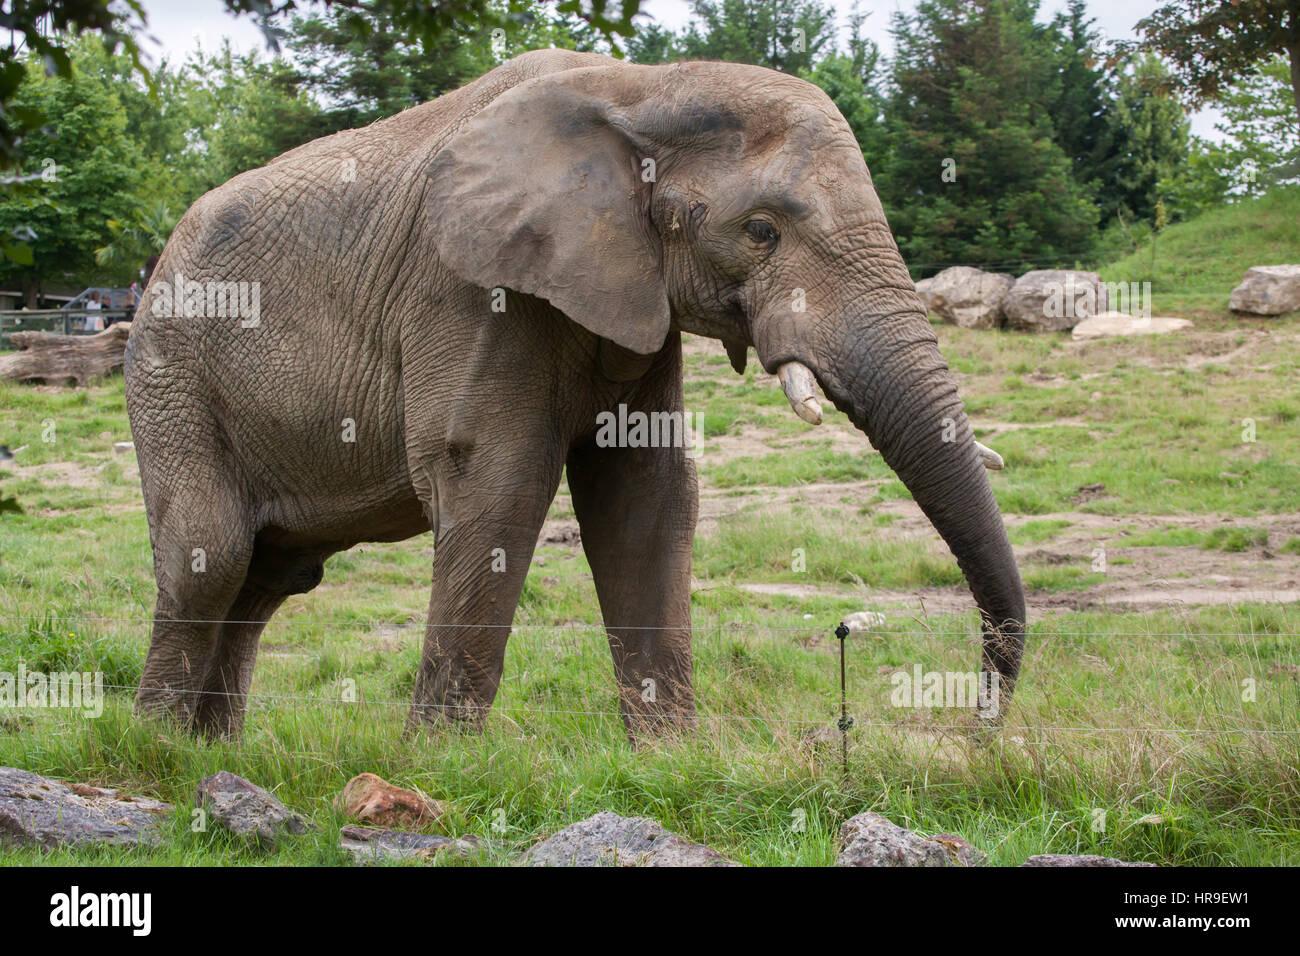 African bush elephant (Loxodonta africana) at Beauval Zoo in Saint-Aignan sur Cher, Loir-et-Cher, France. - Stock Image